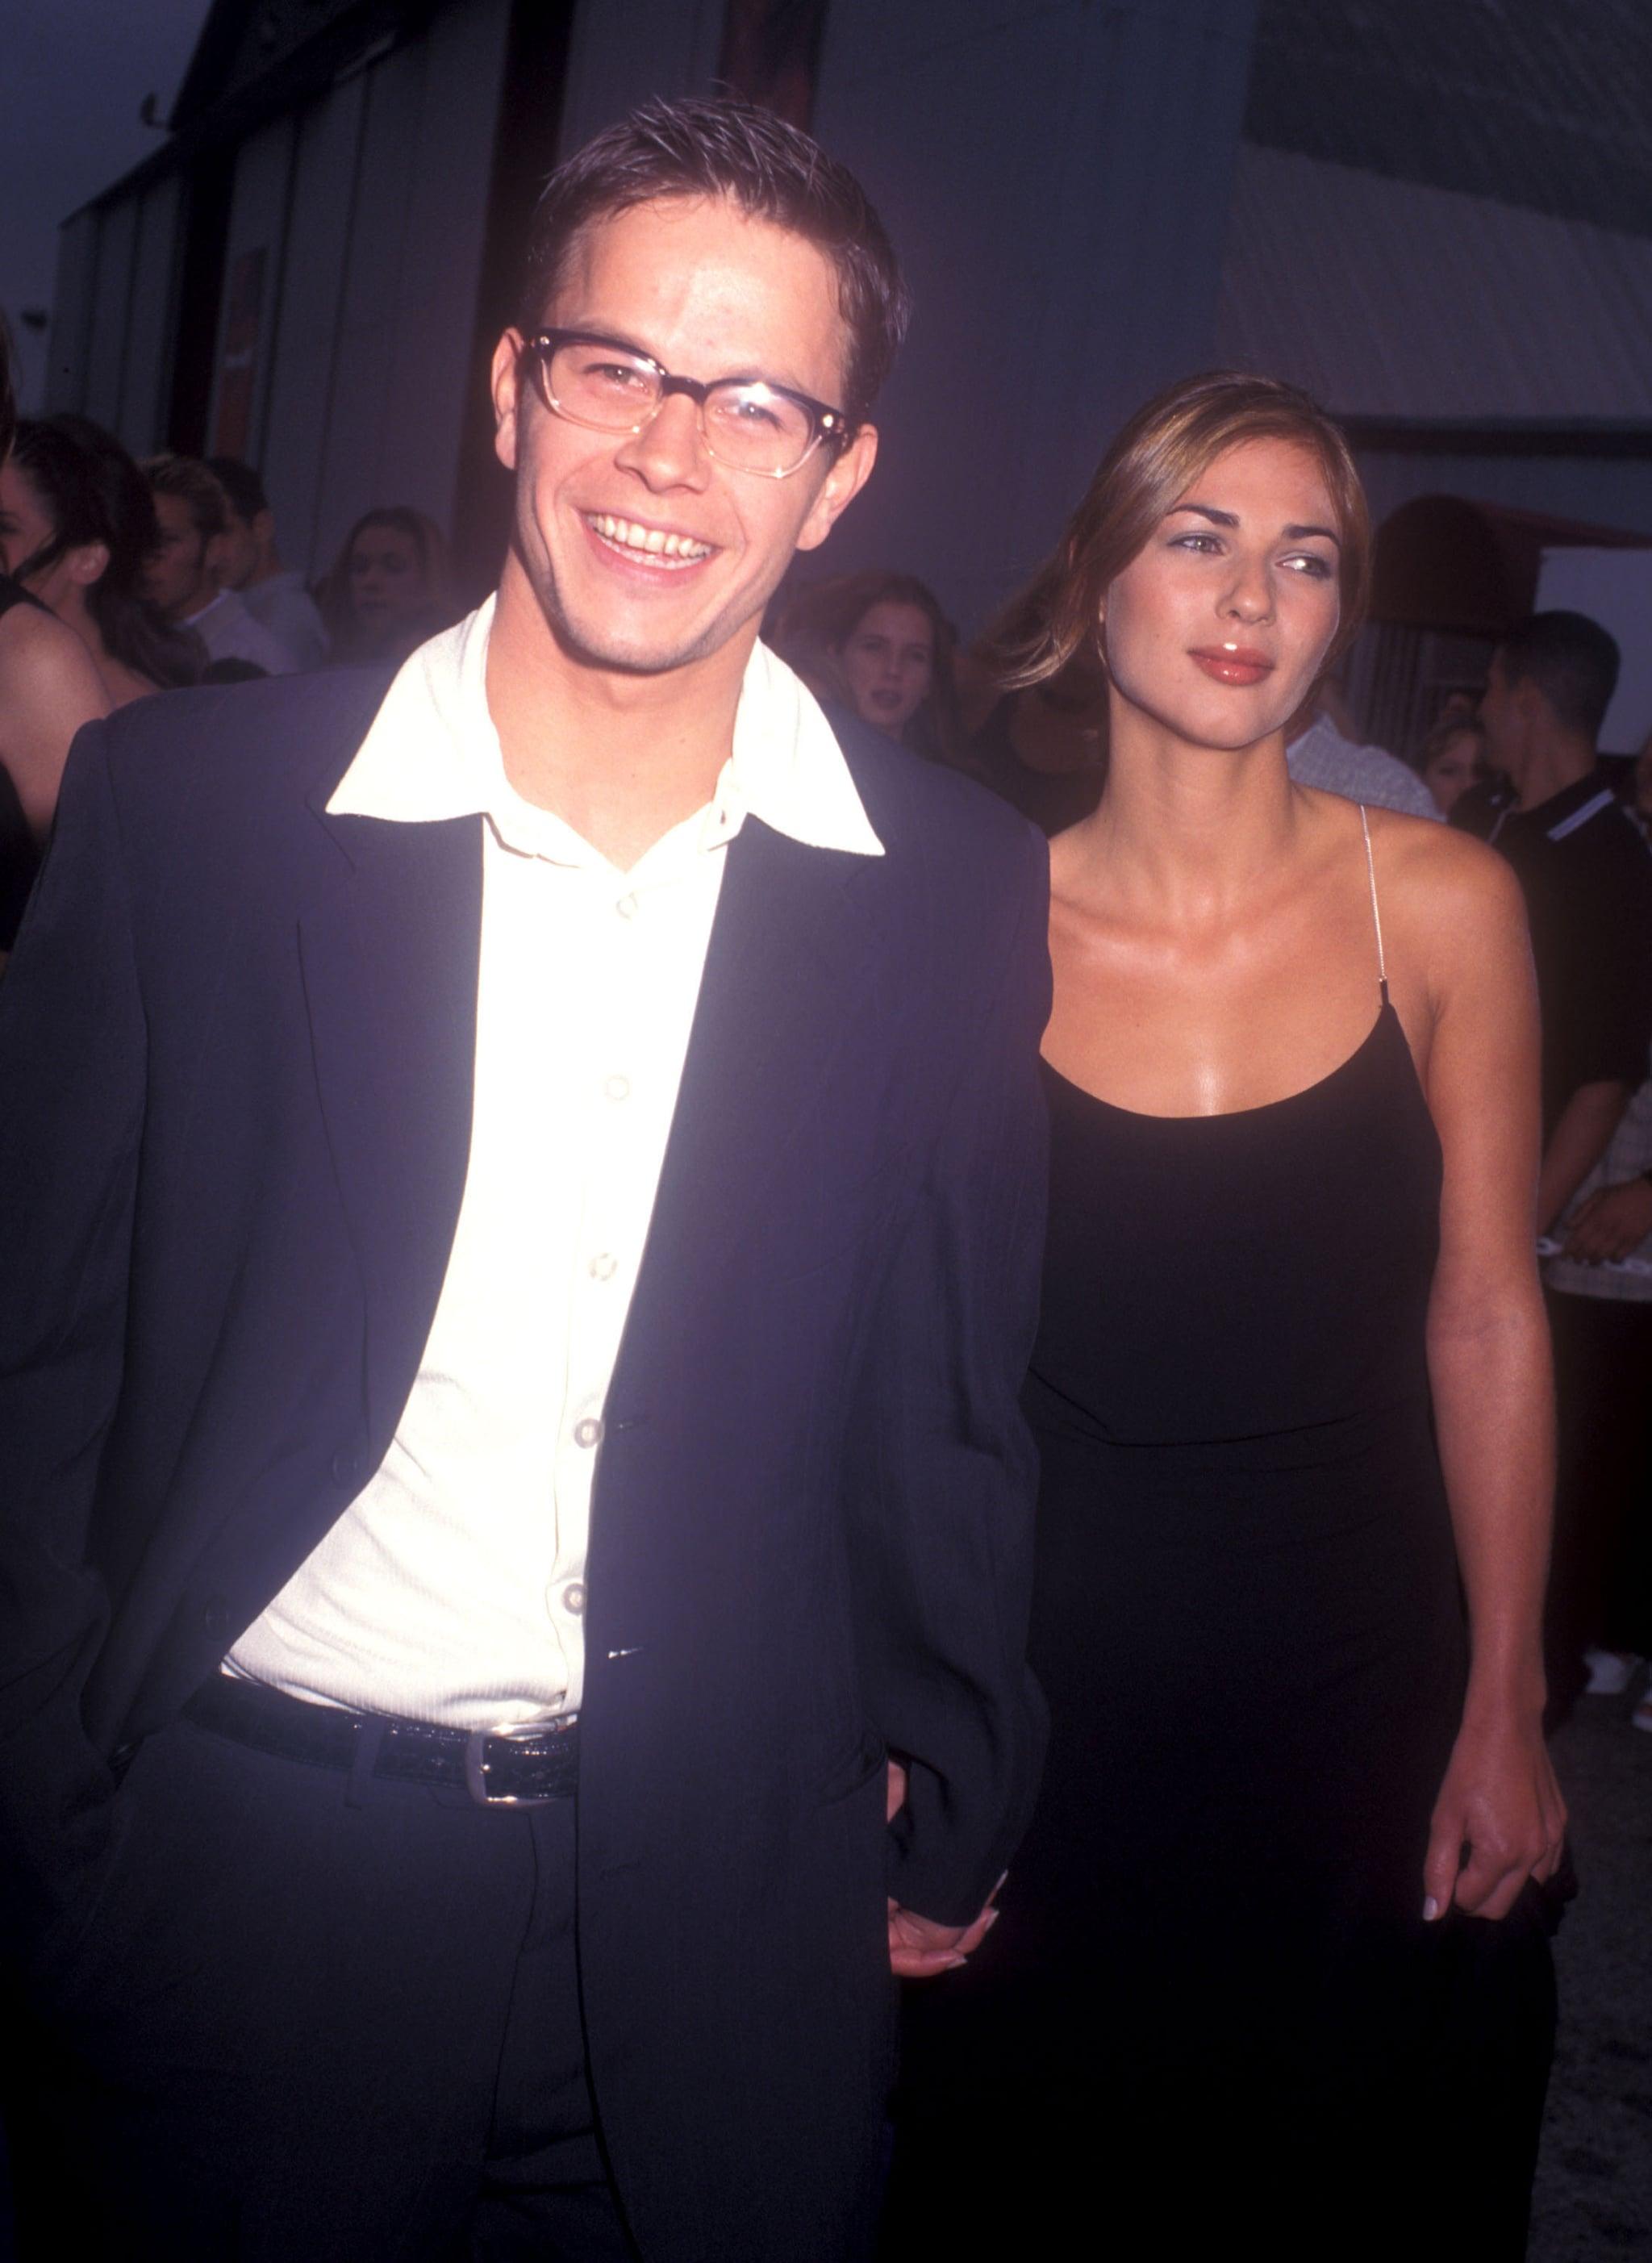 Mark Wahlberg was busy boogying.